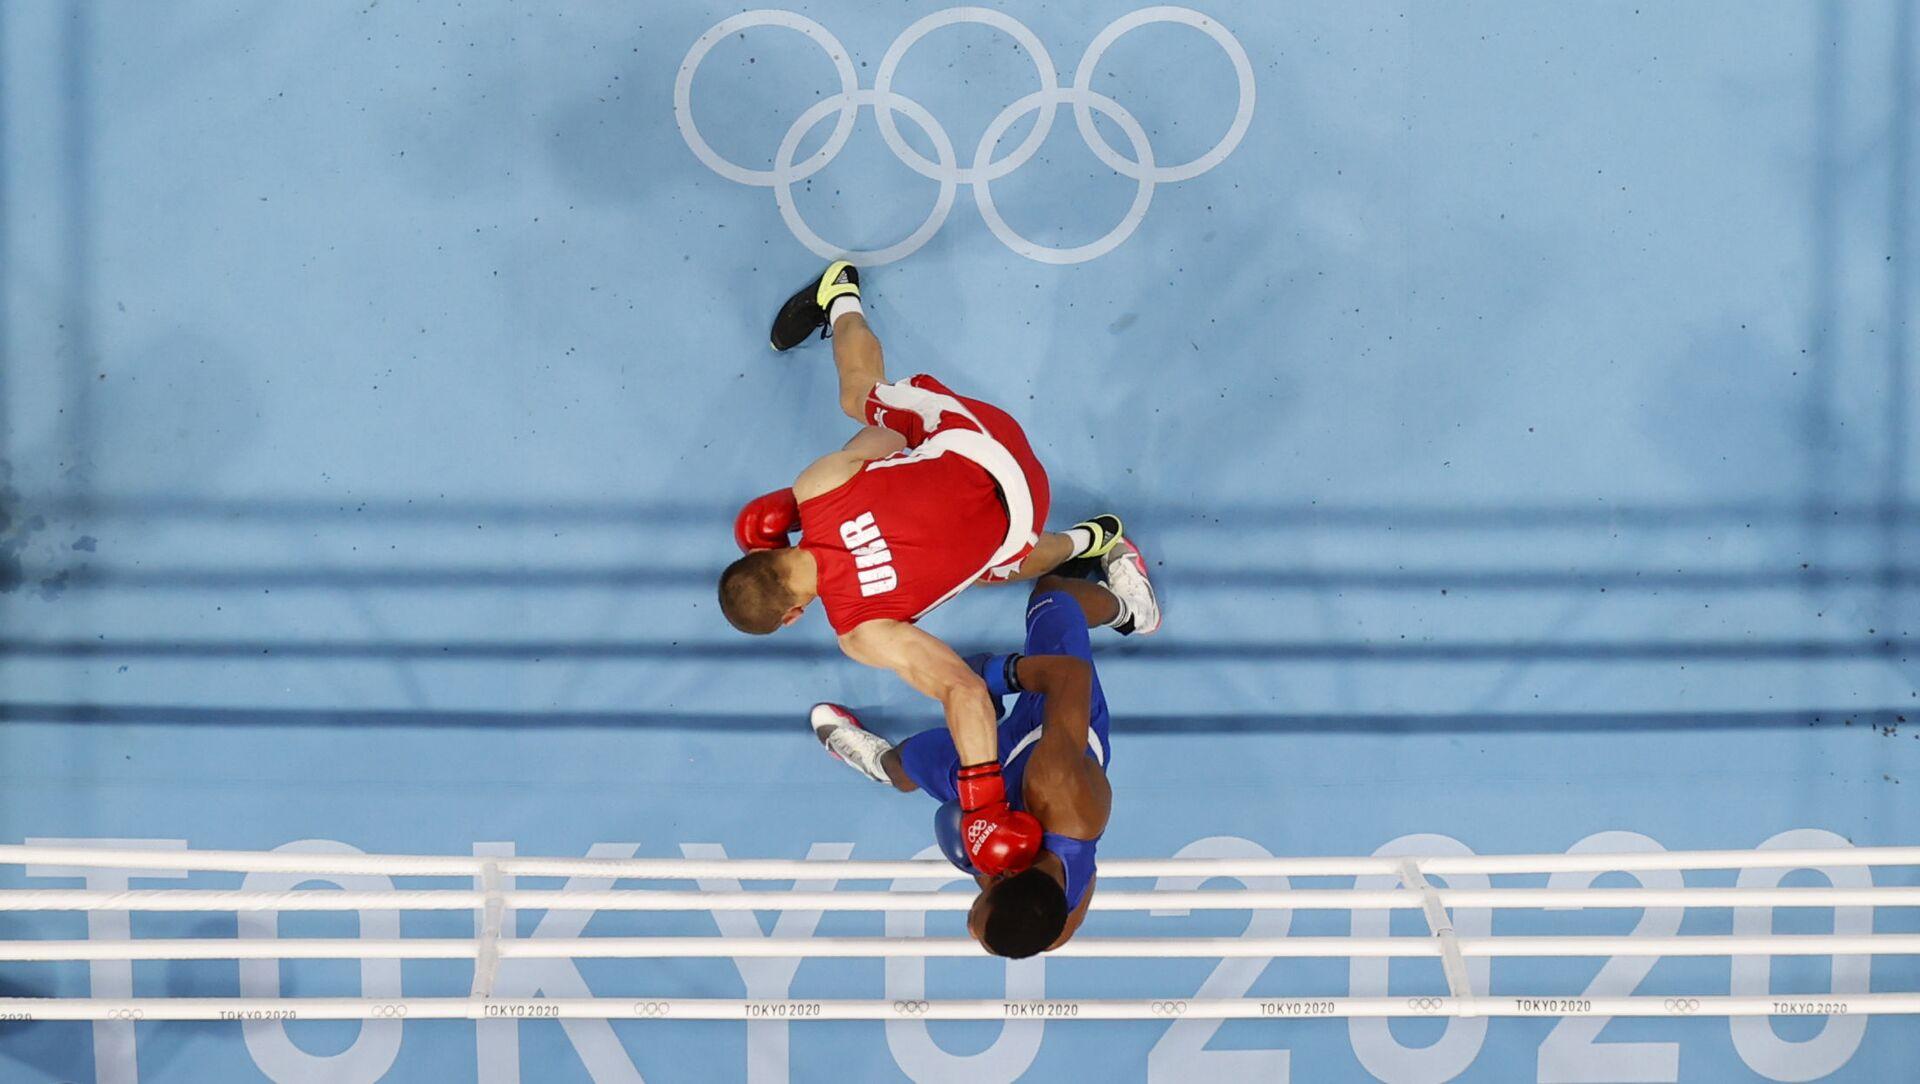 Tokyo 2020 Olympics - Boxing - Men's Middleweight - Quarterfinal - KKG - Kokugikan Arena - Tokyo, Japan - August 1, 2021 - Sputnik International, 1920, 01.08.2021